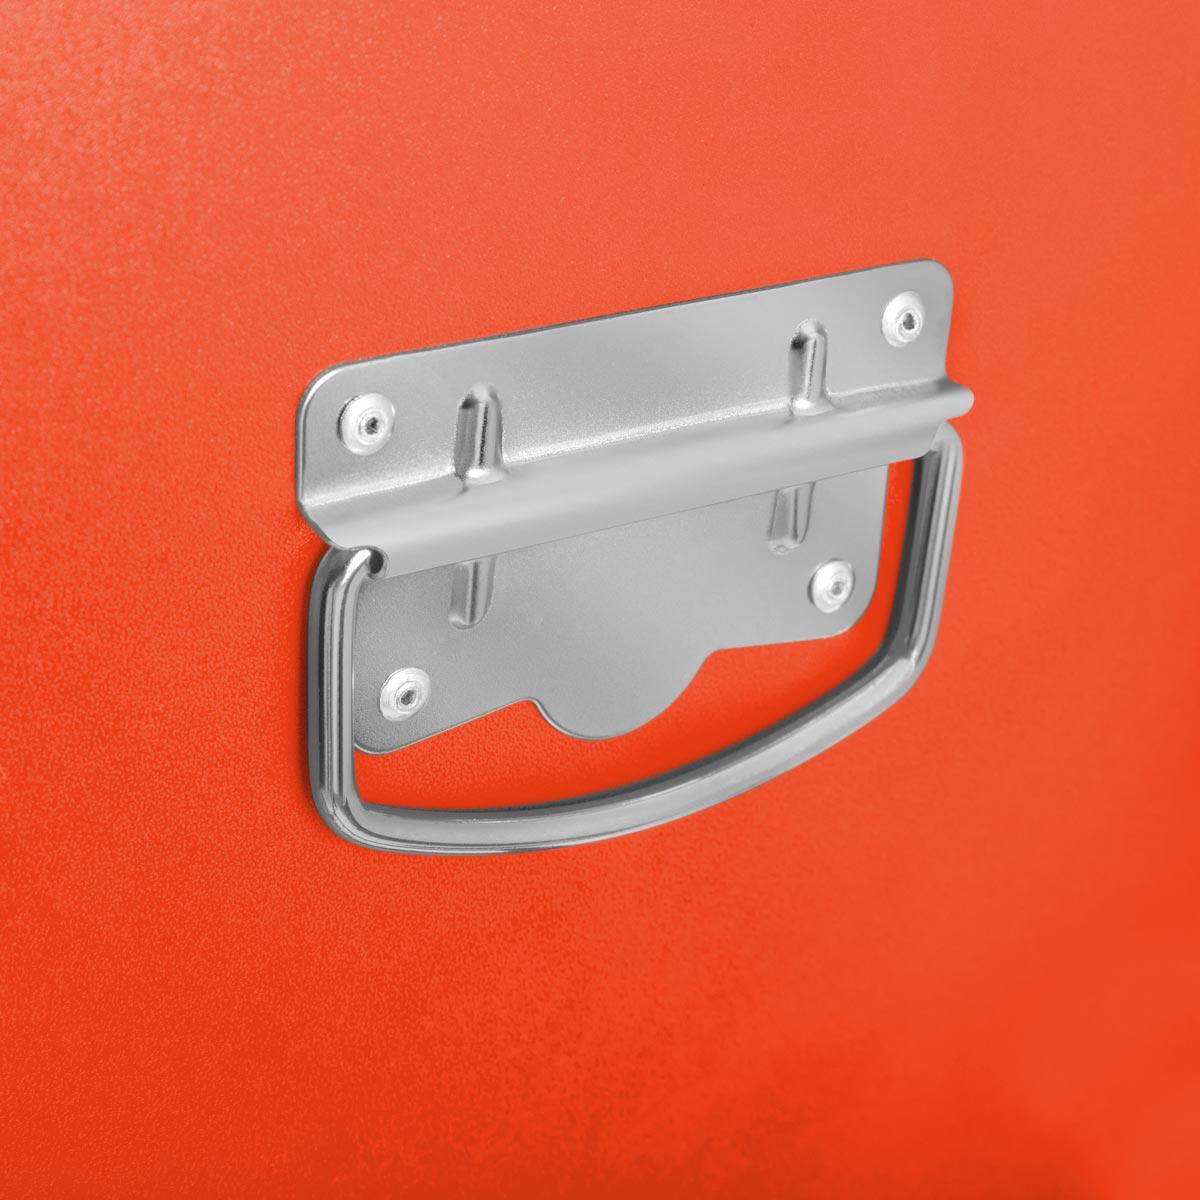 miniatura 26 - Carro para herramientas PRO armario acero 4 ruedas 10 cajones GREENCUT